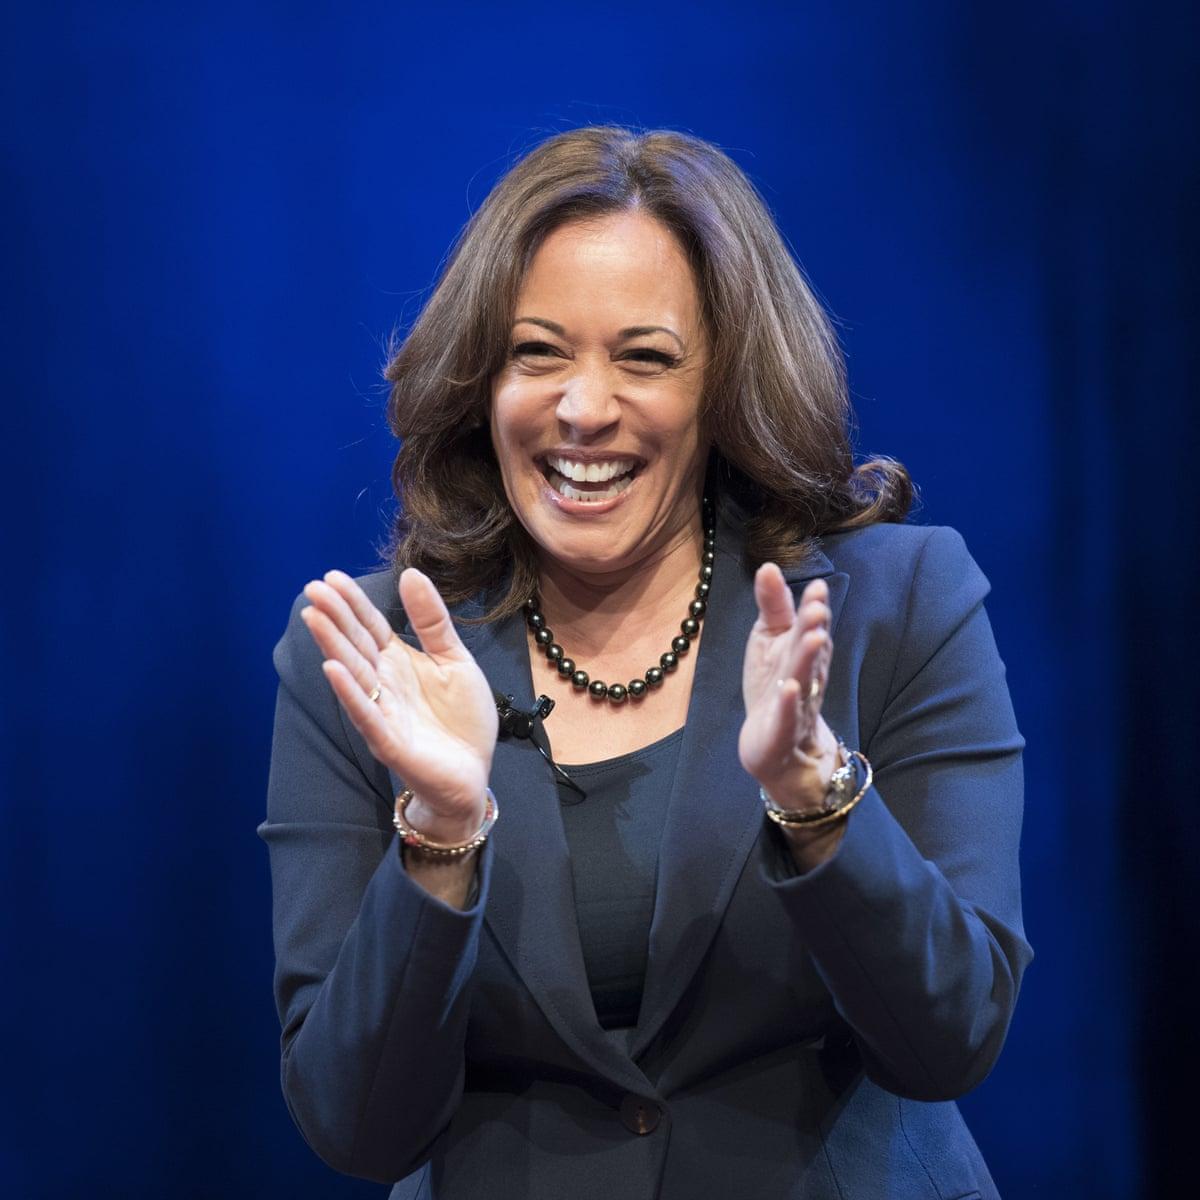 Kamala Harris Invites Speculation Over 2020 White House Bid Democrats The Guardian